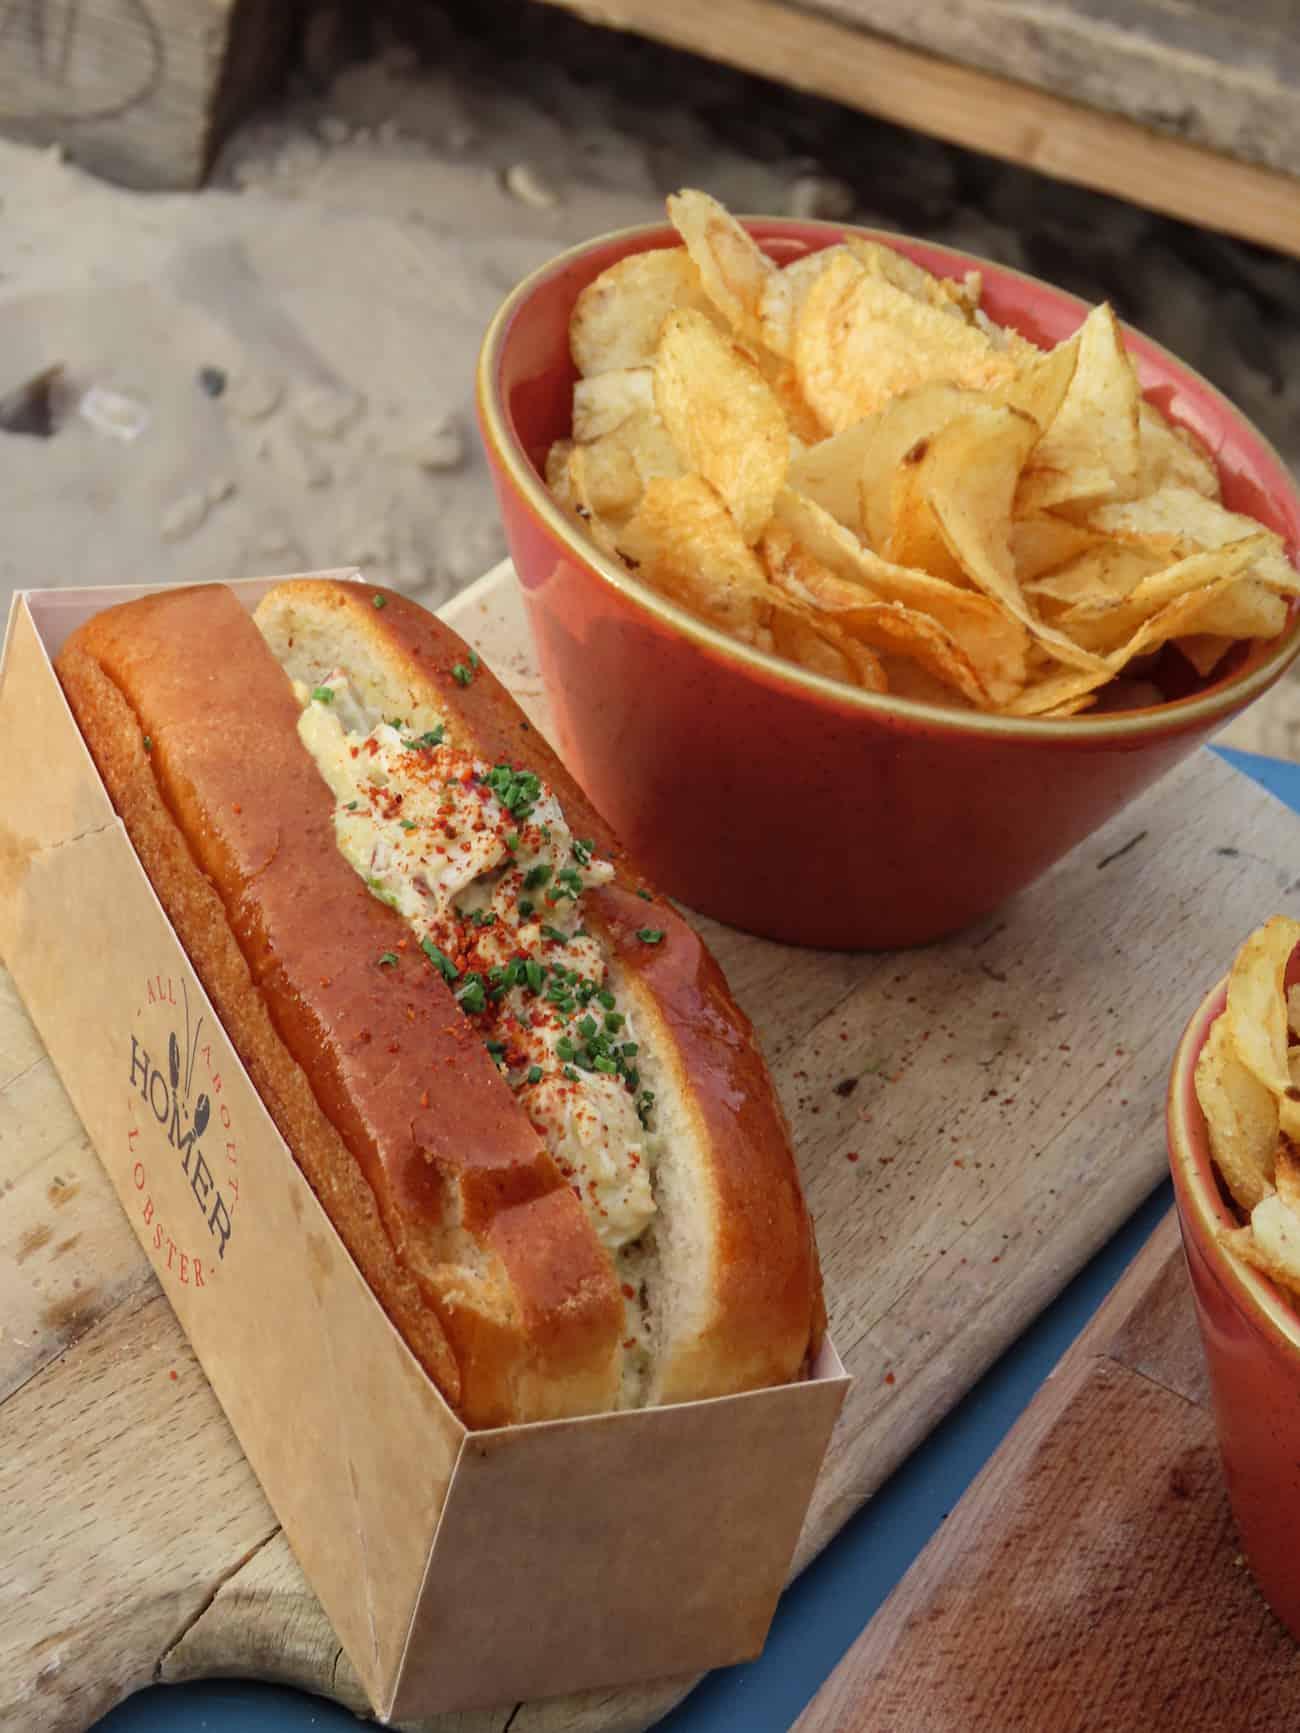 polpo-plage-terrasse-paris-bord-seine-restaurant-15